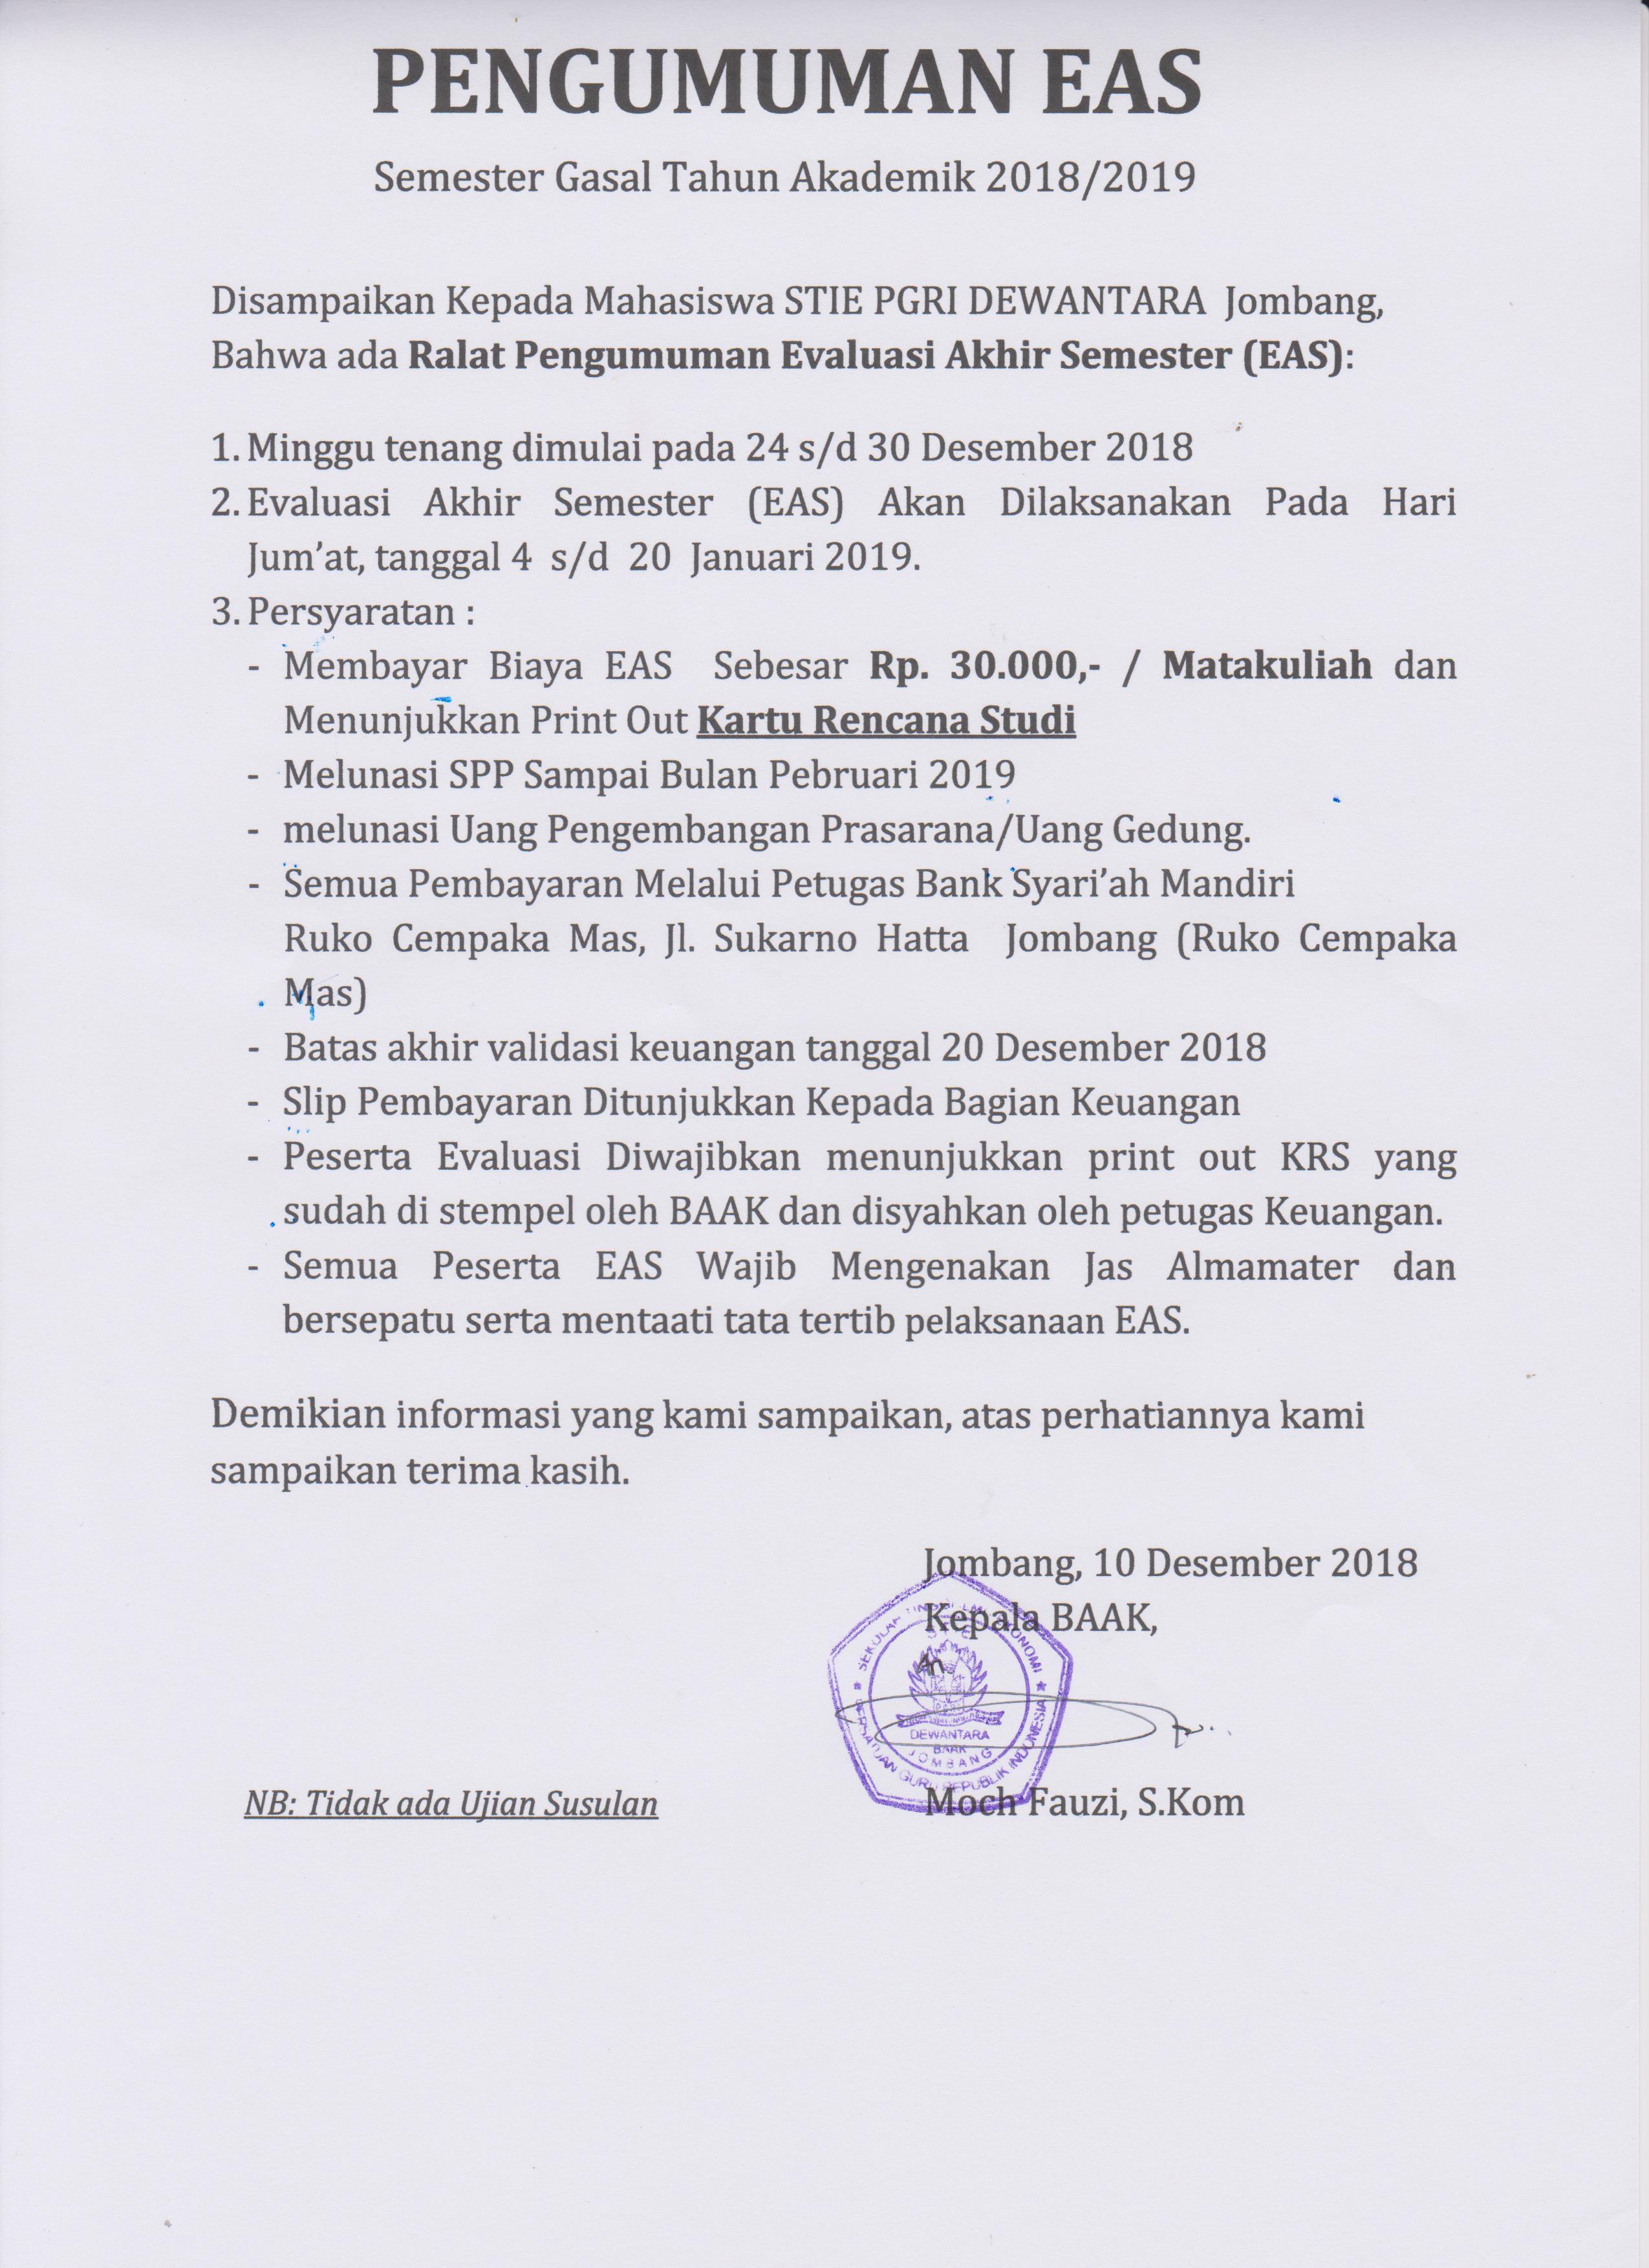 PENGUMUMAN EAS TA 2018-2019